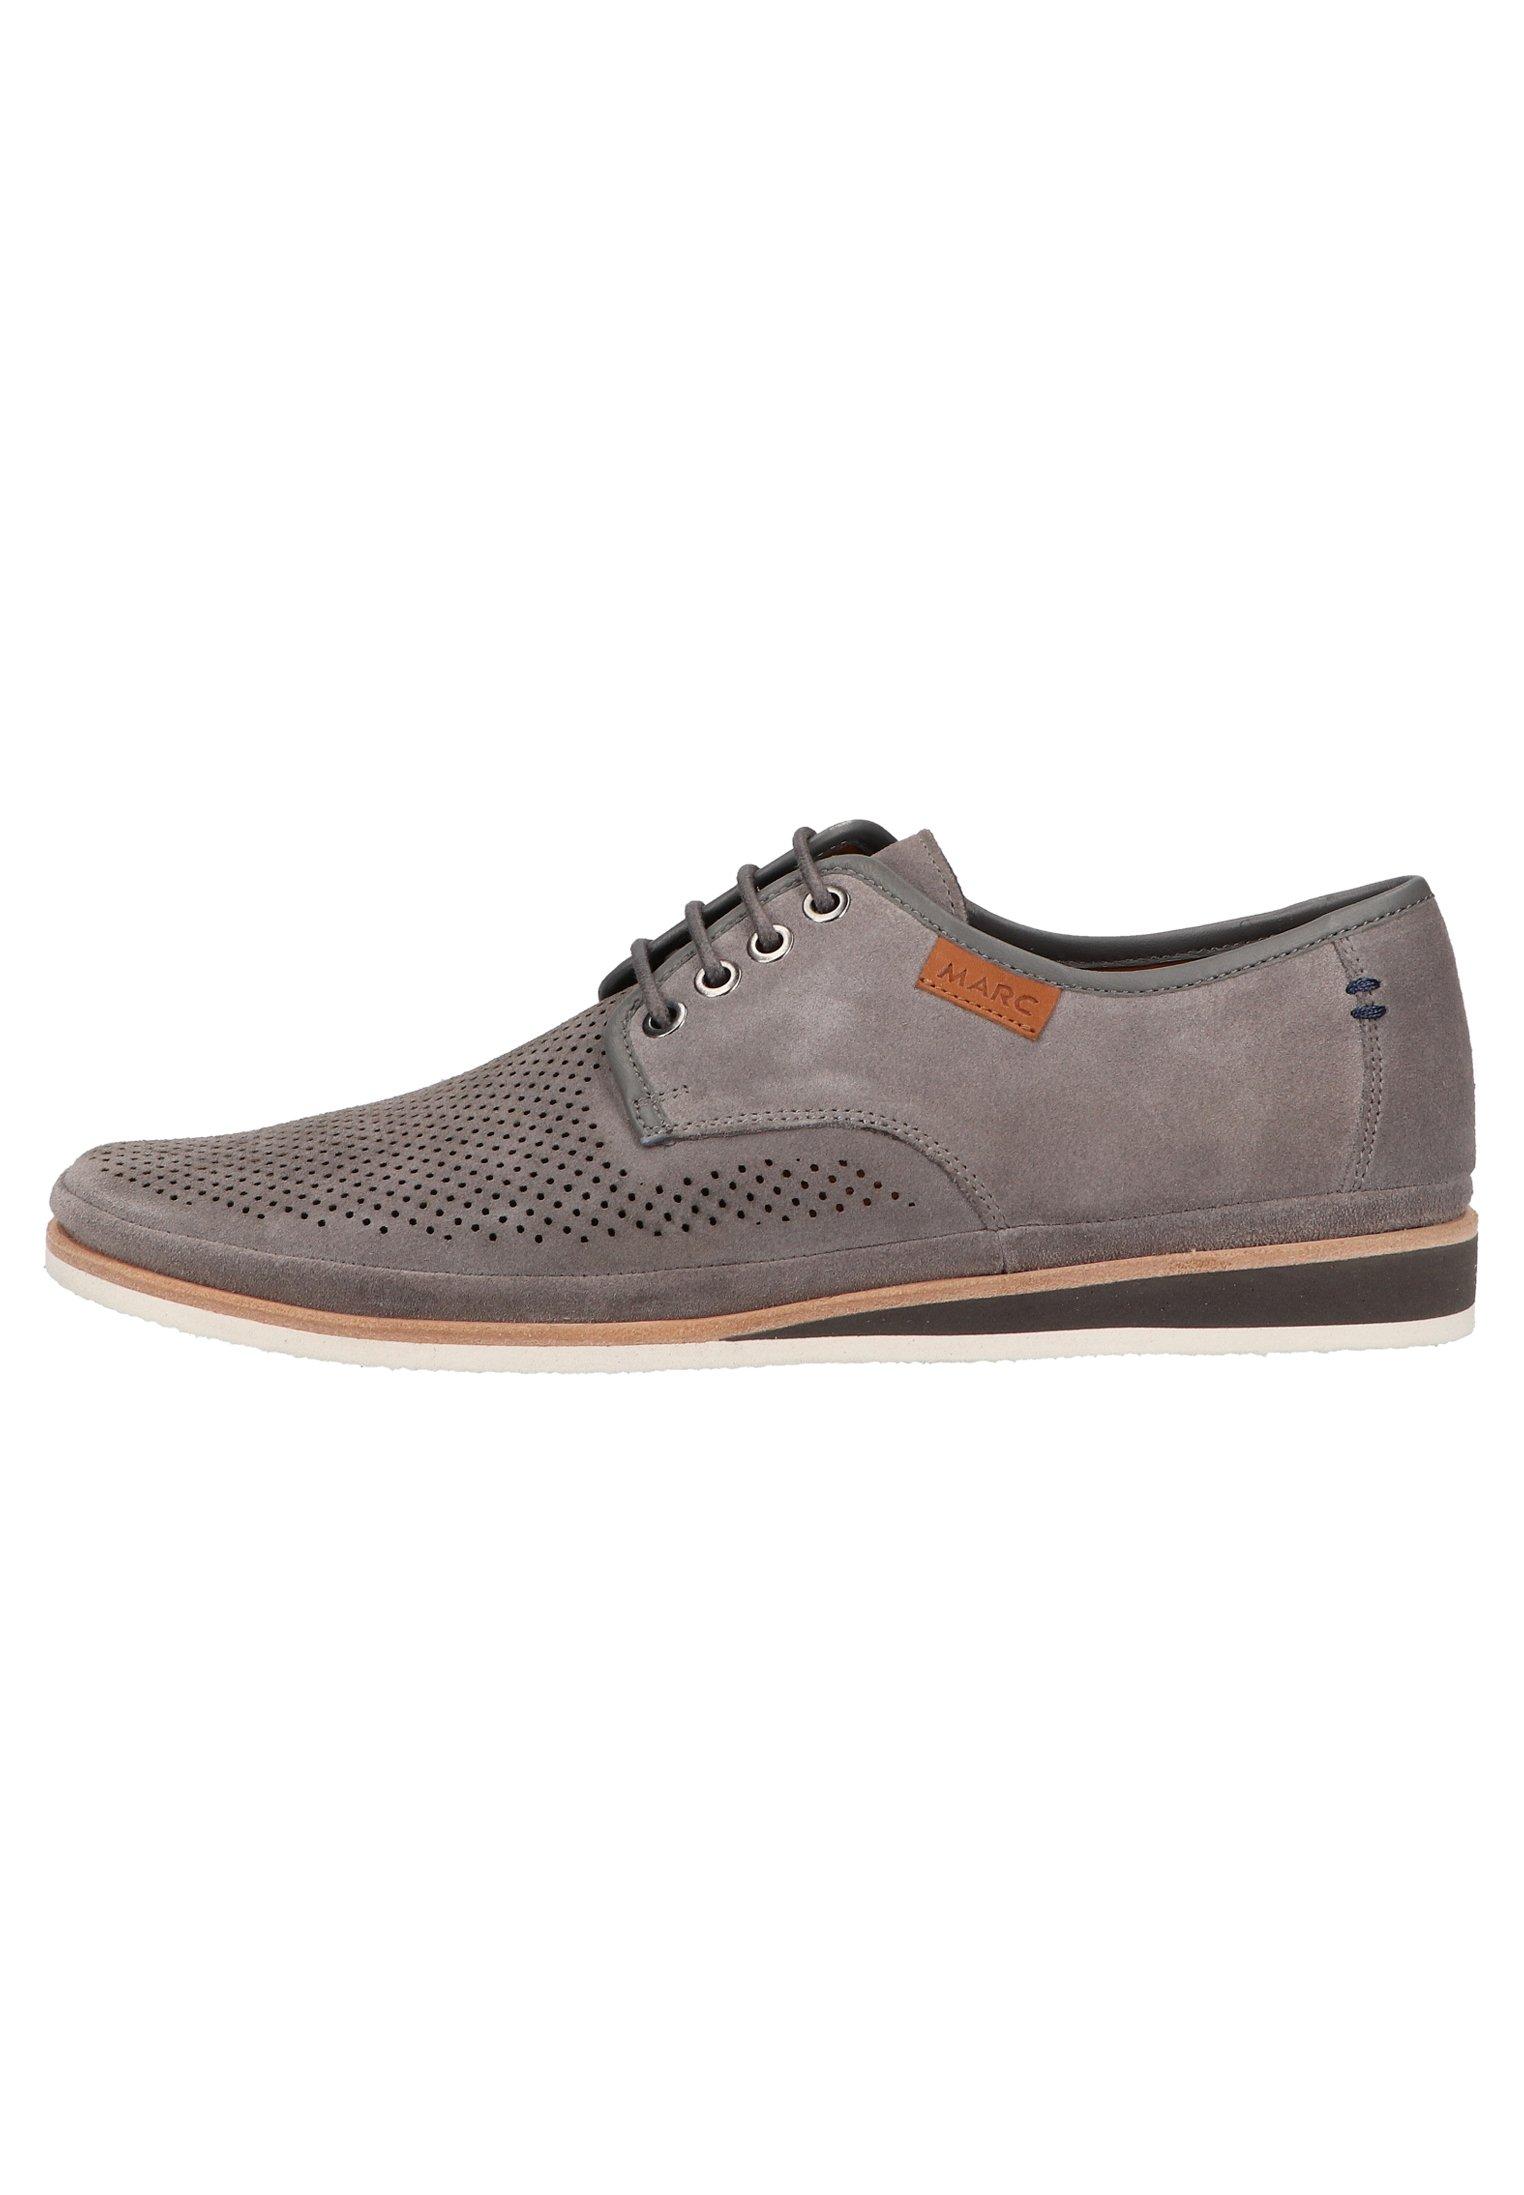 Homme Chaussures à lacets - grey